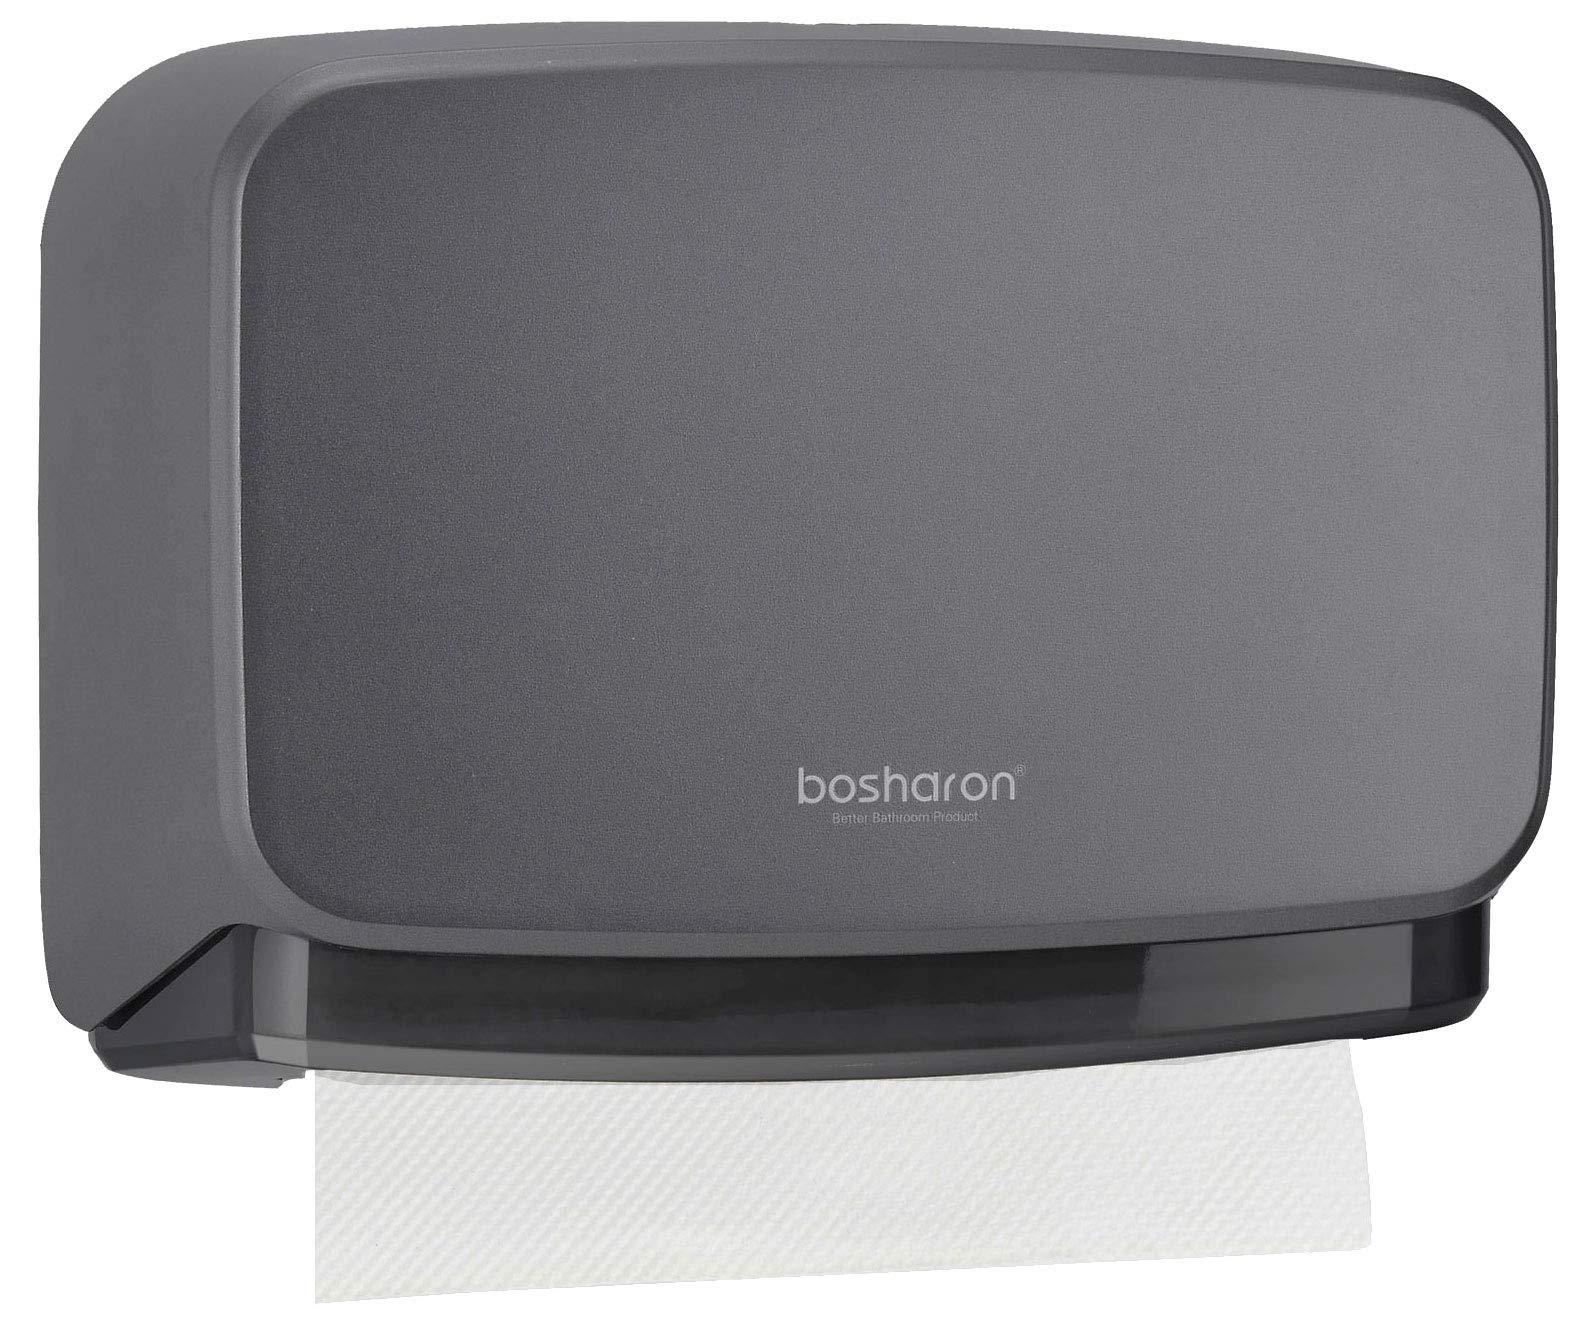 Bosharon Wall-Mounted Bathroom Tissue Dispenser Paper Towel Tissue Holder (Grey)